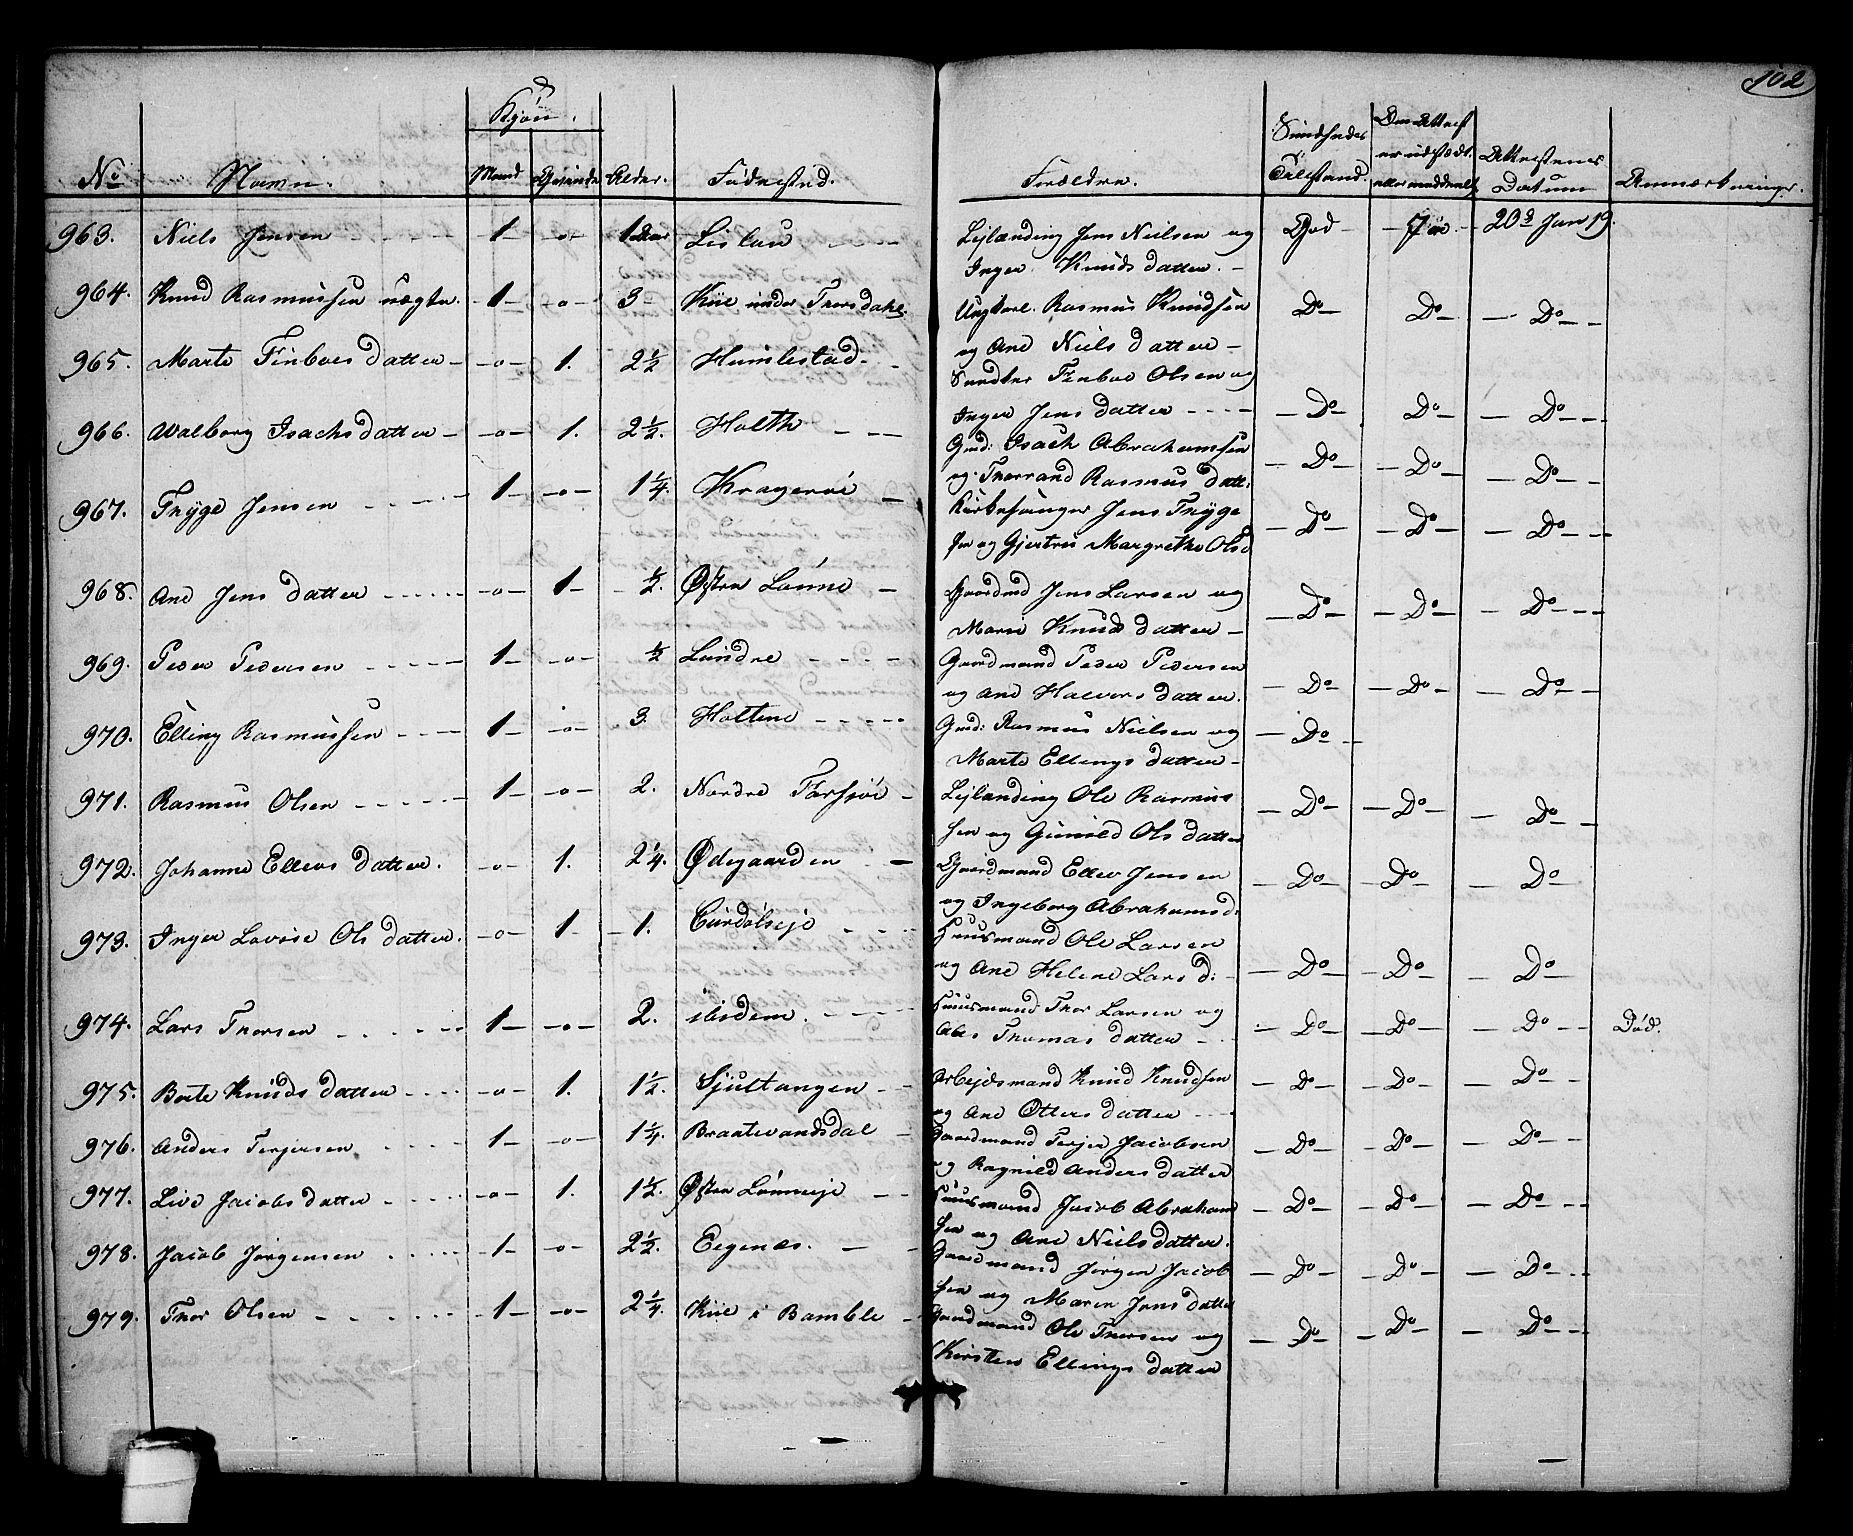 SAKO, Kragerø kirkebøker, F/Fa/L0003: Ministerialbok nr. 3, 1802-1813, s. 102